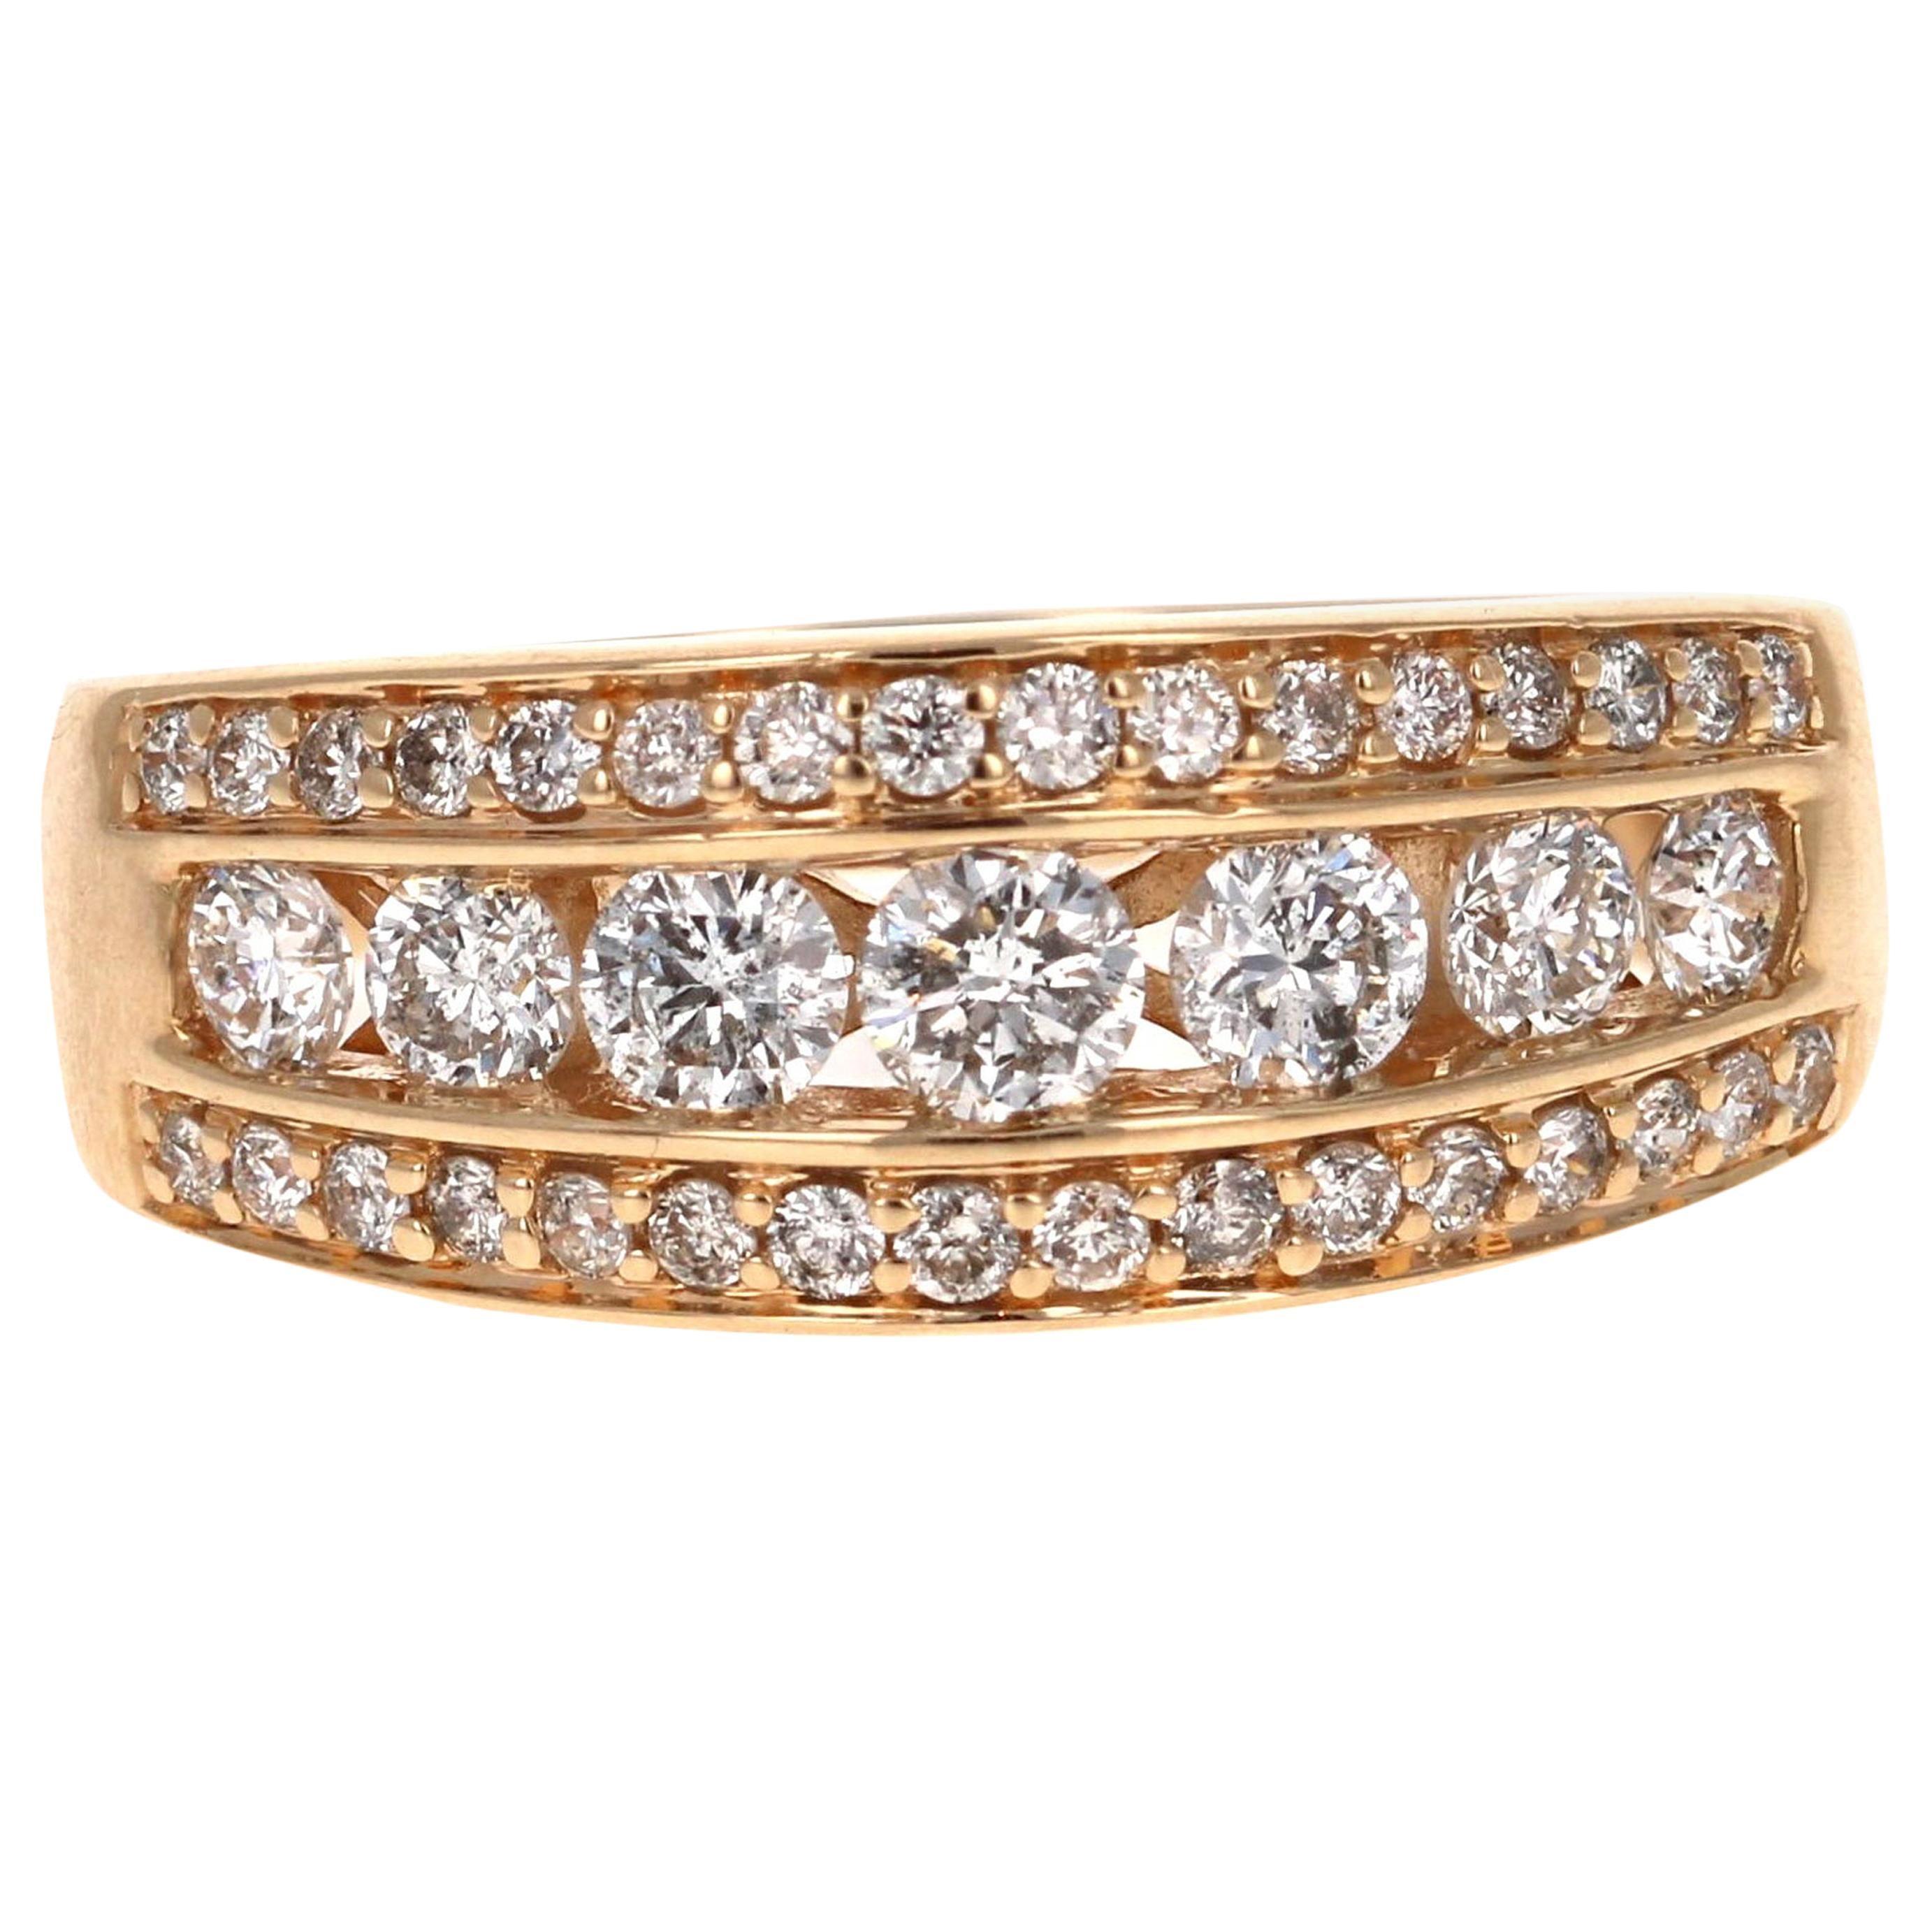 1.20 Carat Diamond Band 14 Karat Yellow Gold